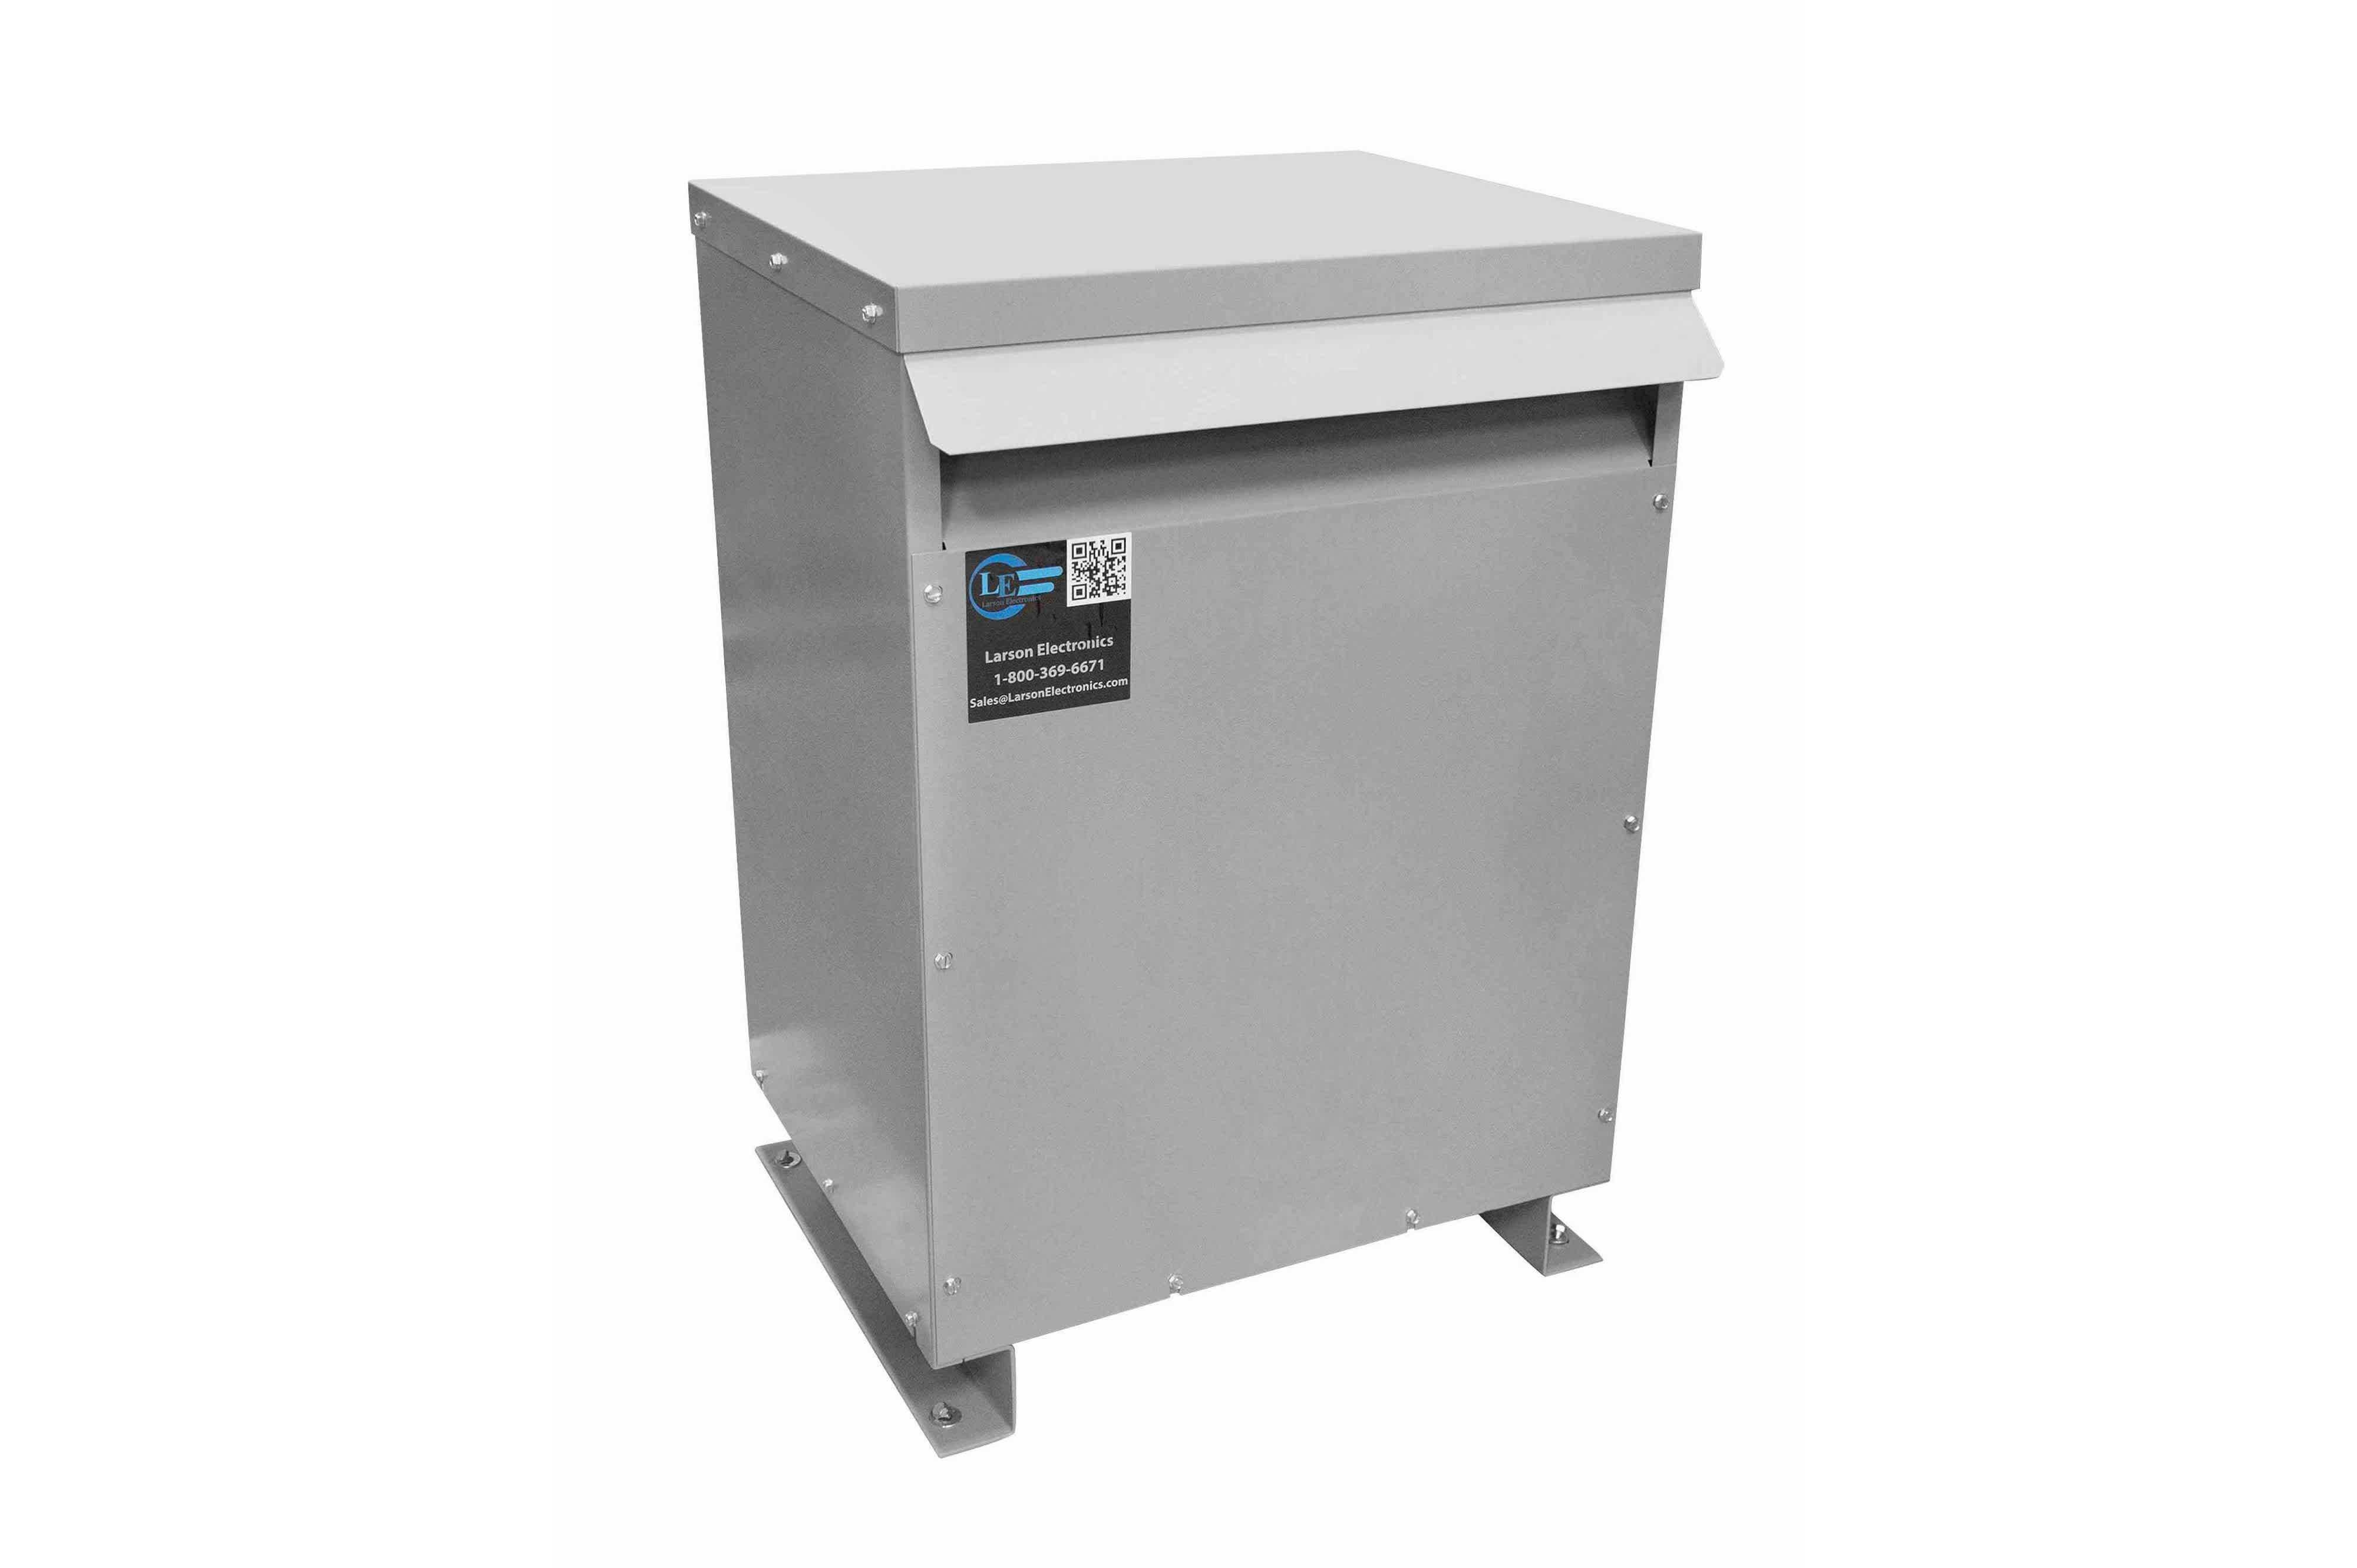 150 kVA 3PH Isolation Transformer, 208V Wye Primary, 400V Delta Secondary, N3R, Ventilated, 60 Hz